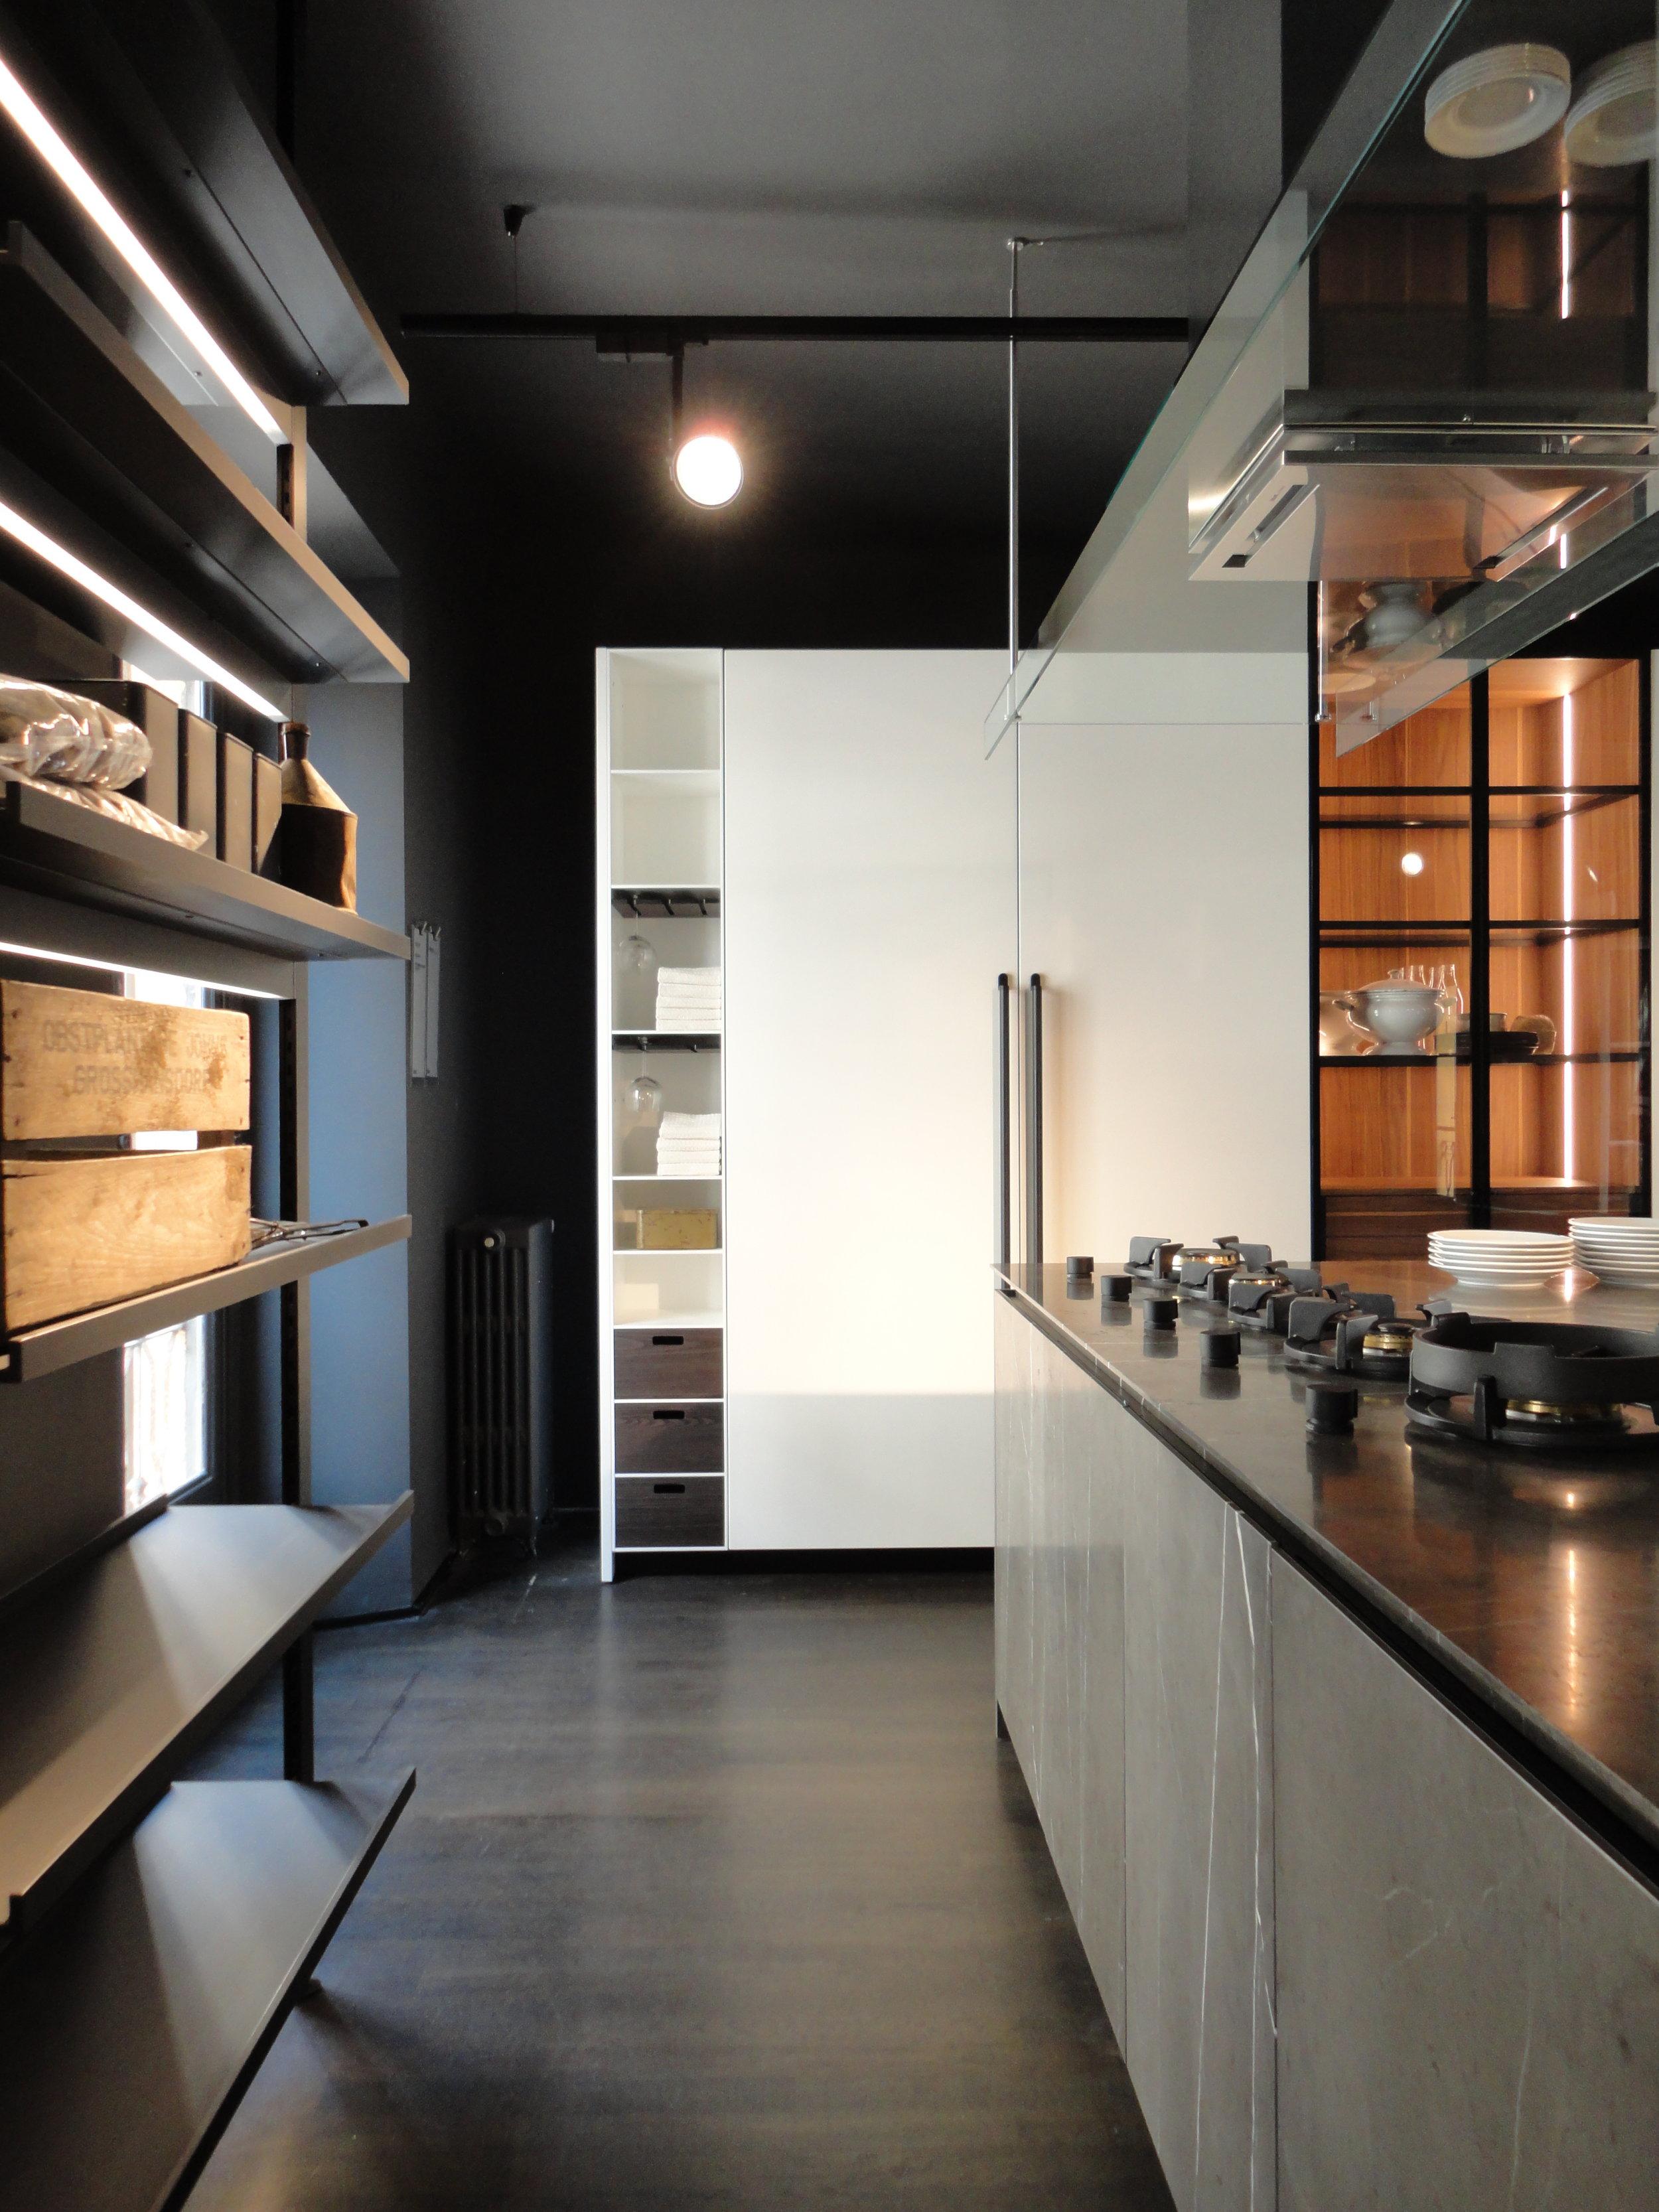 Balanced kitchen storage and display at Boffi